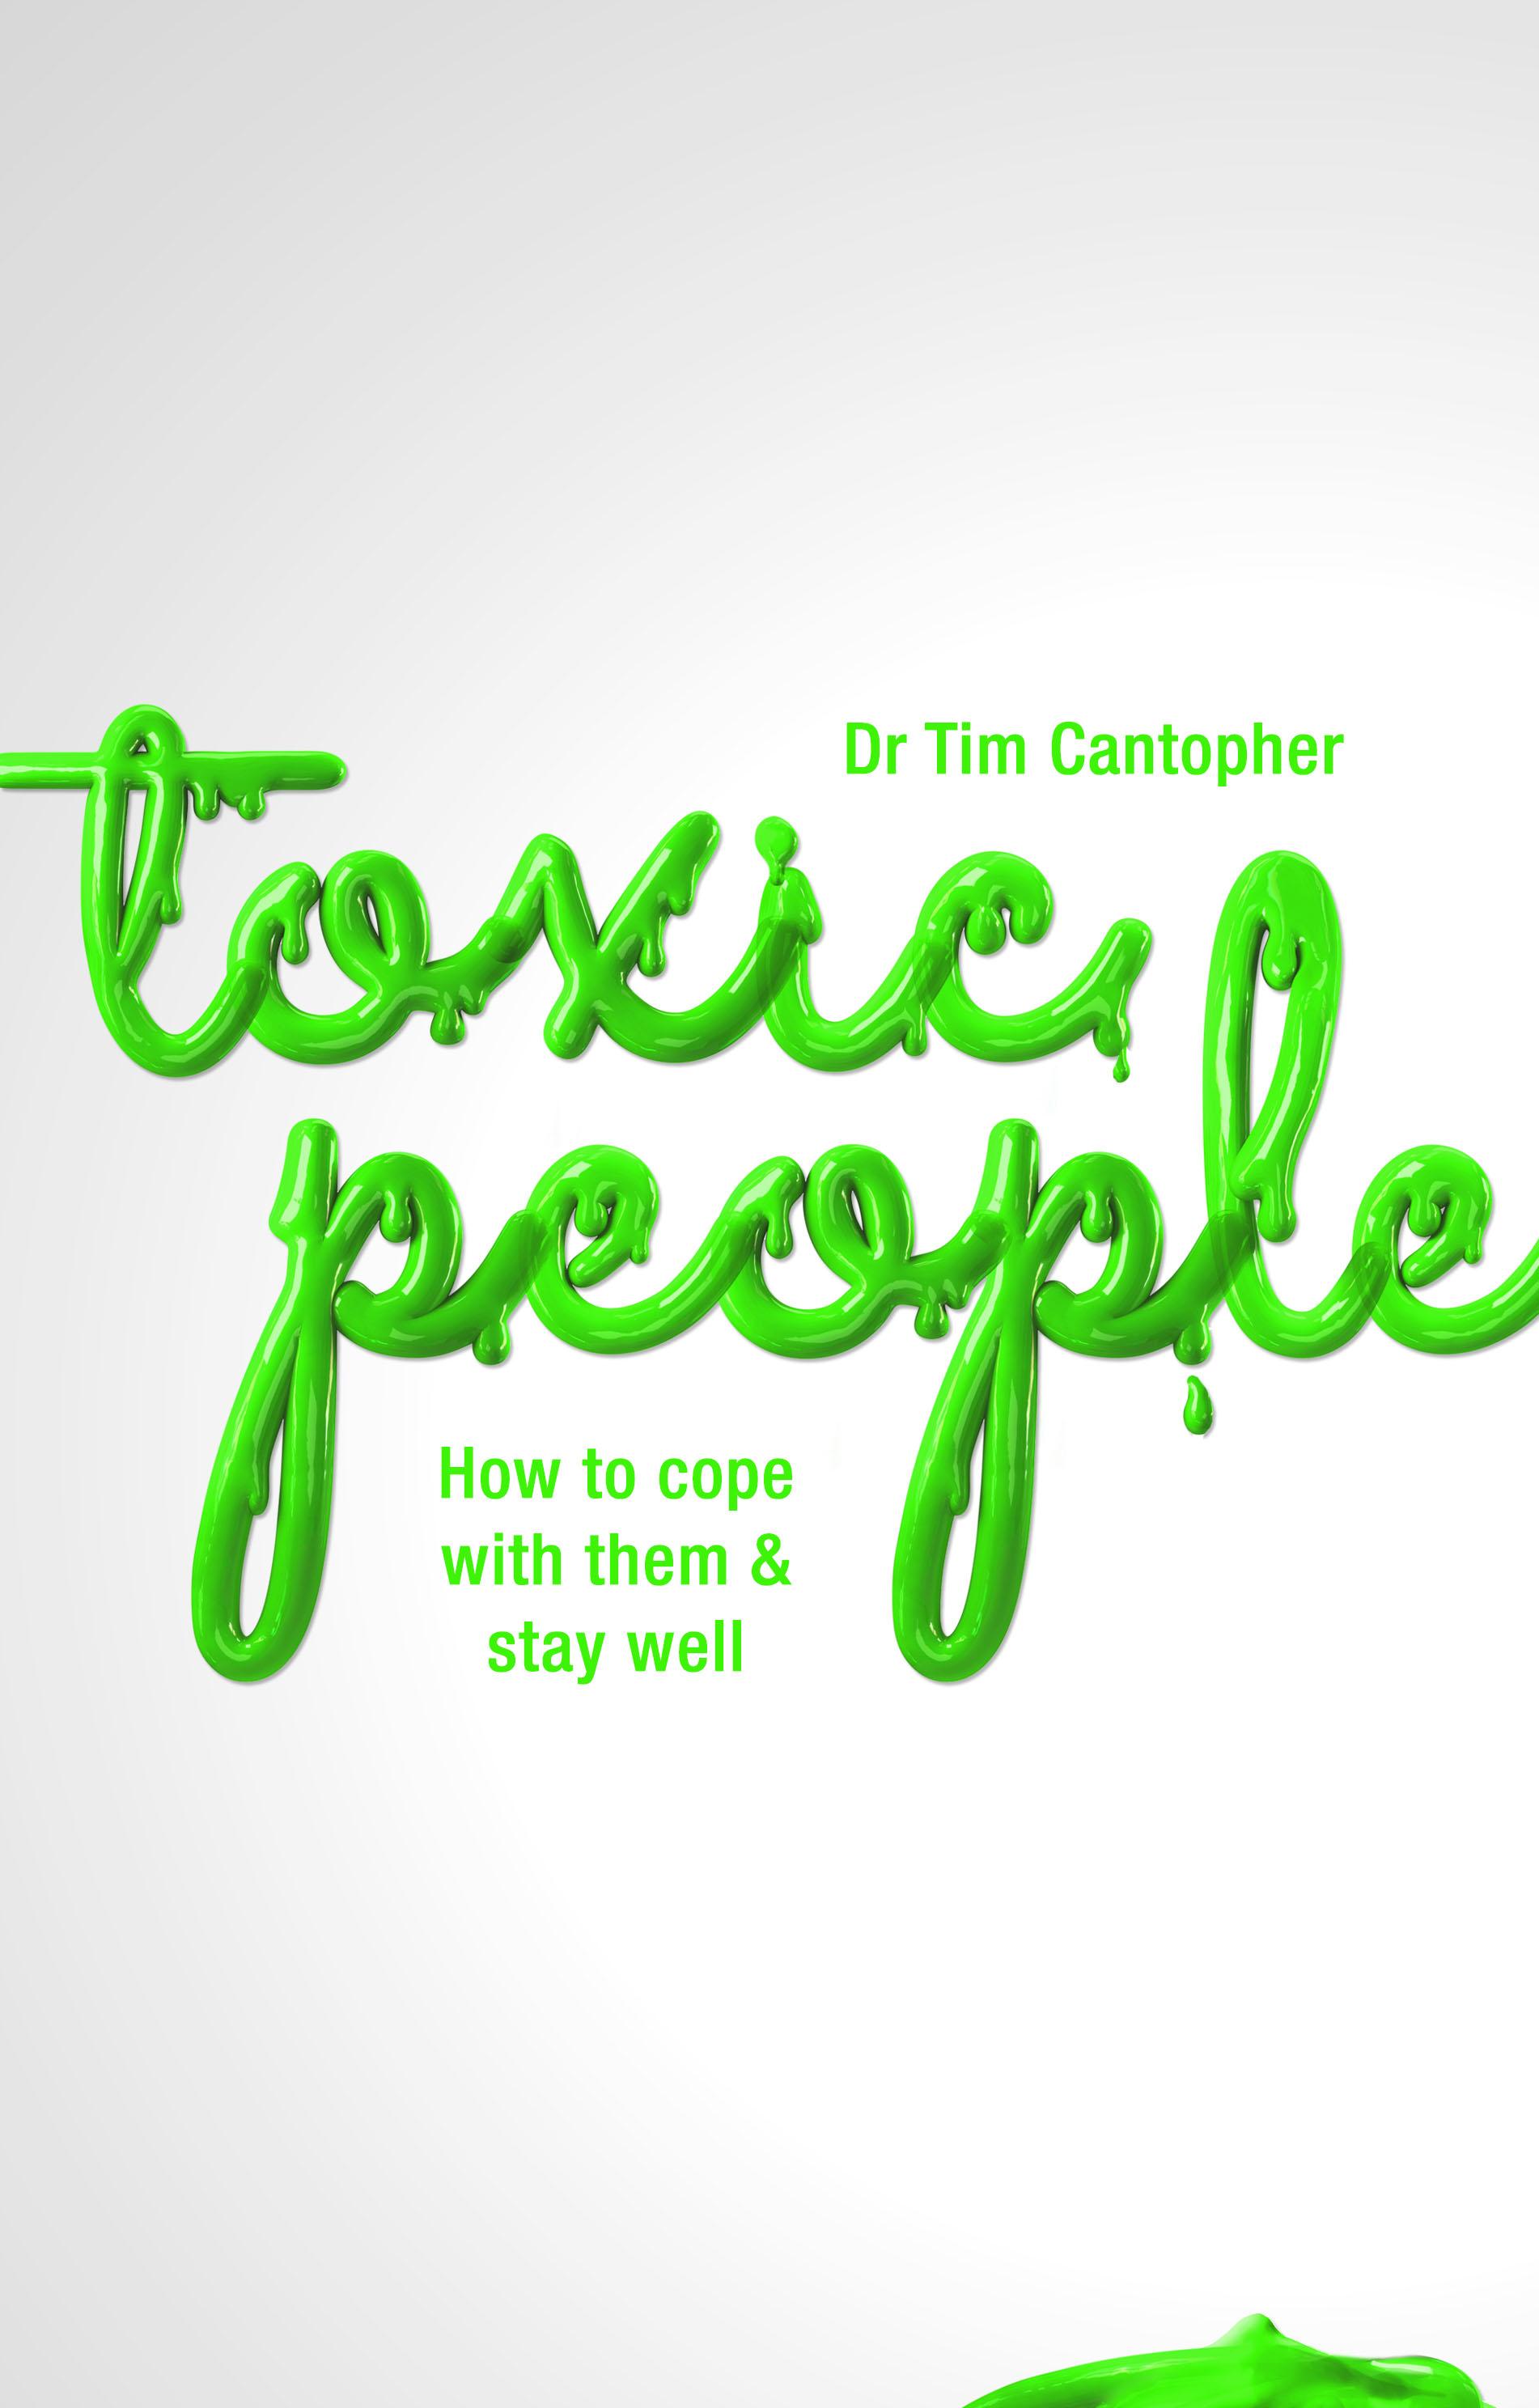 toxic rough1.jpg